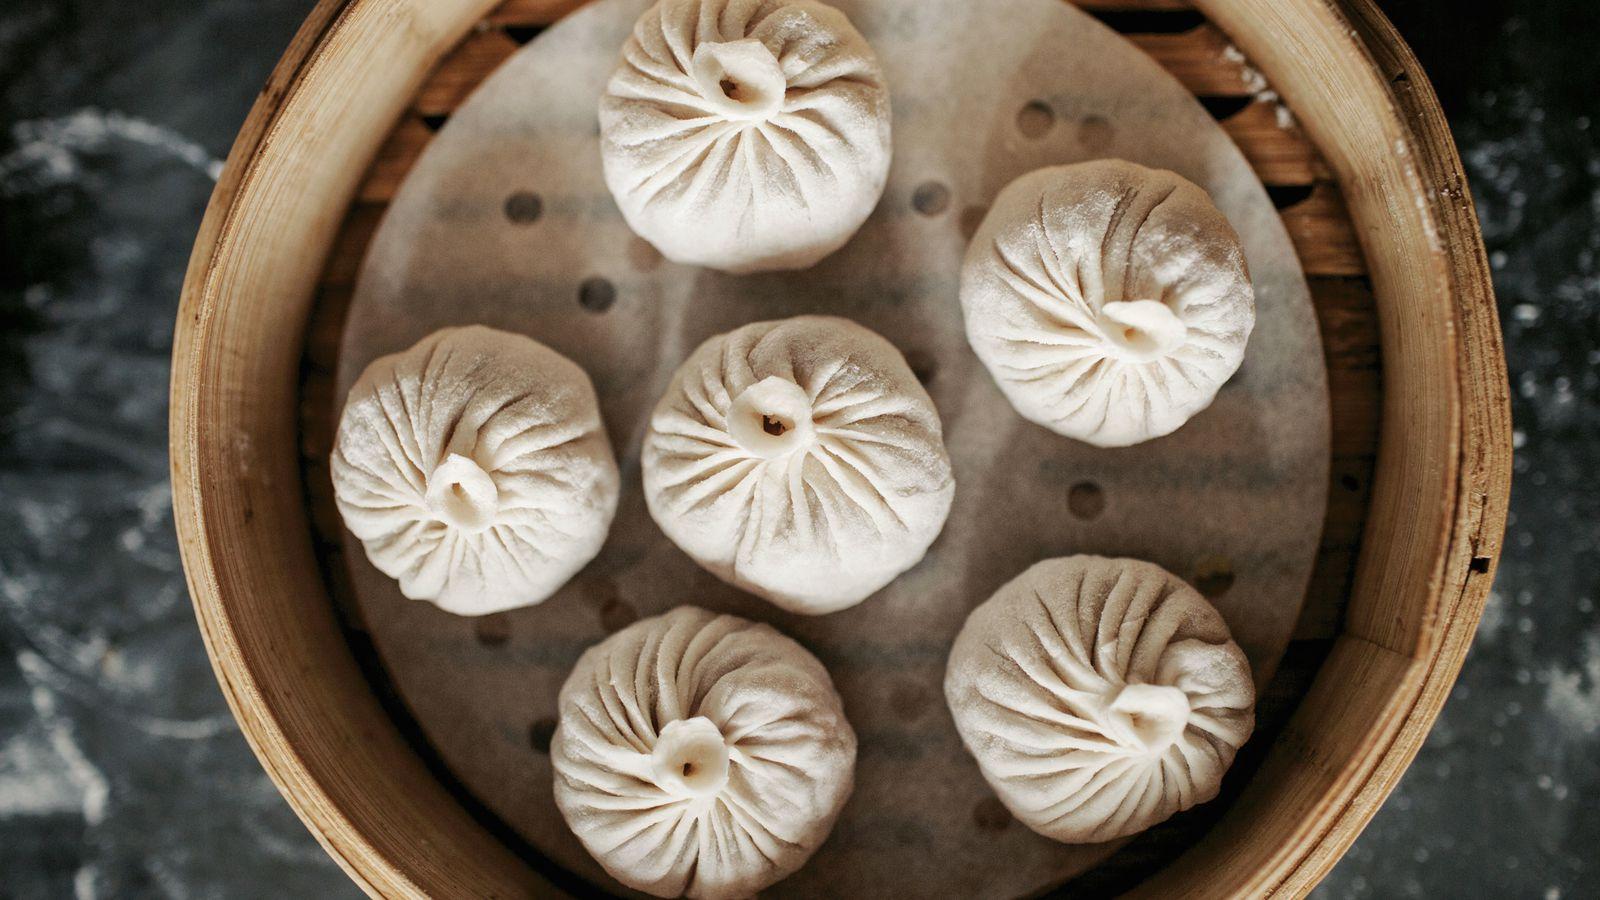 Recipe: How to Make Shanghai-Style Soup Dumplings